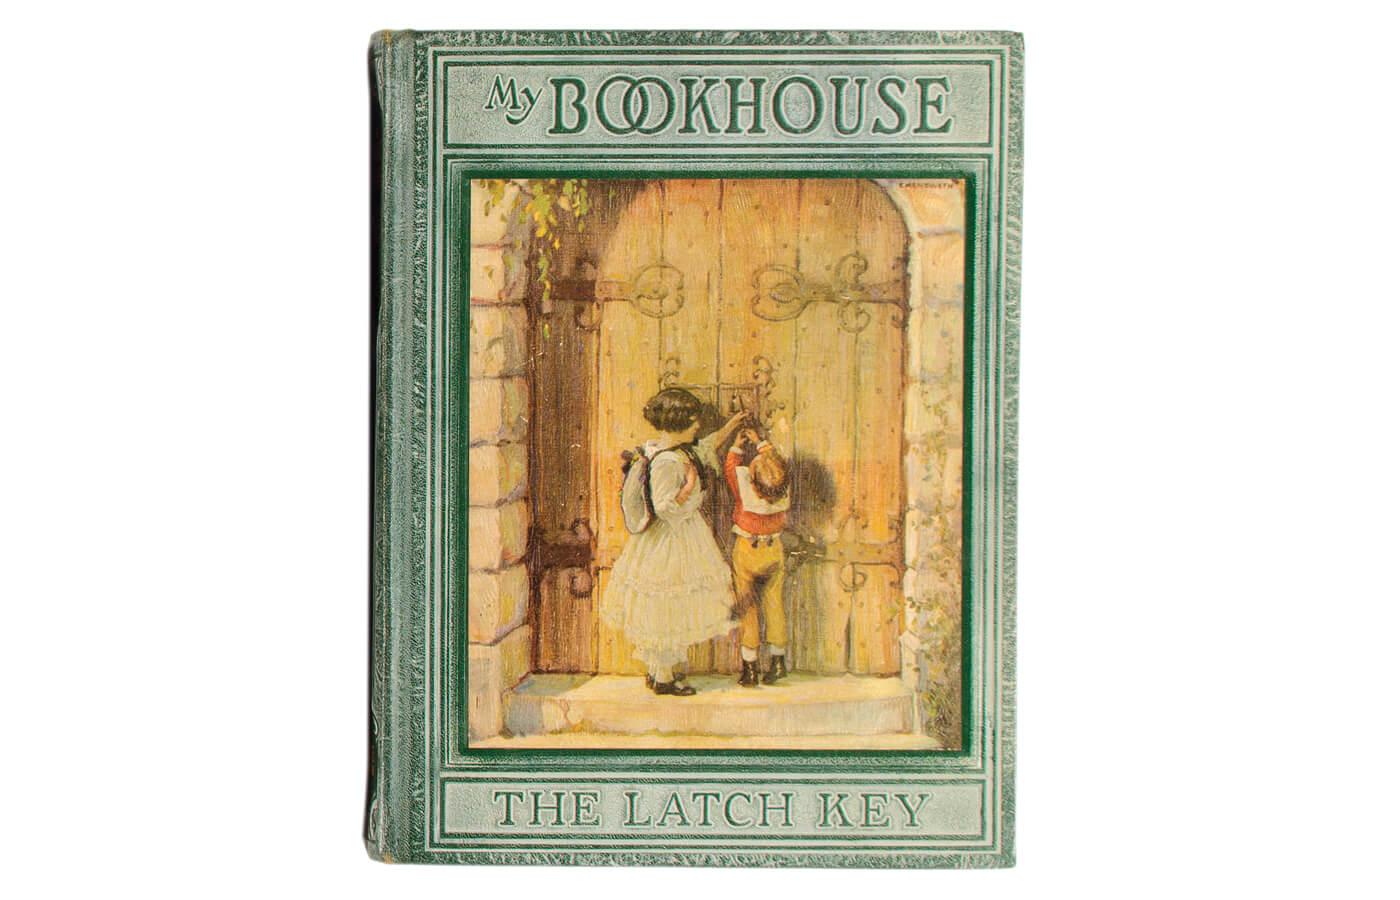 The Latch Key